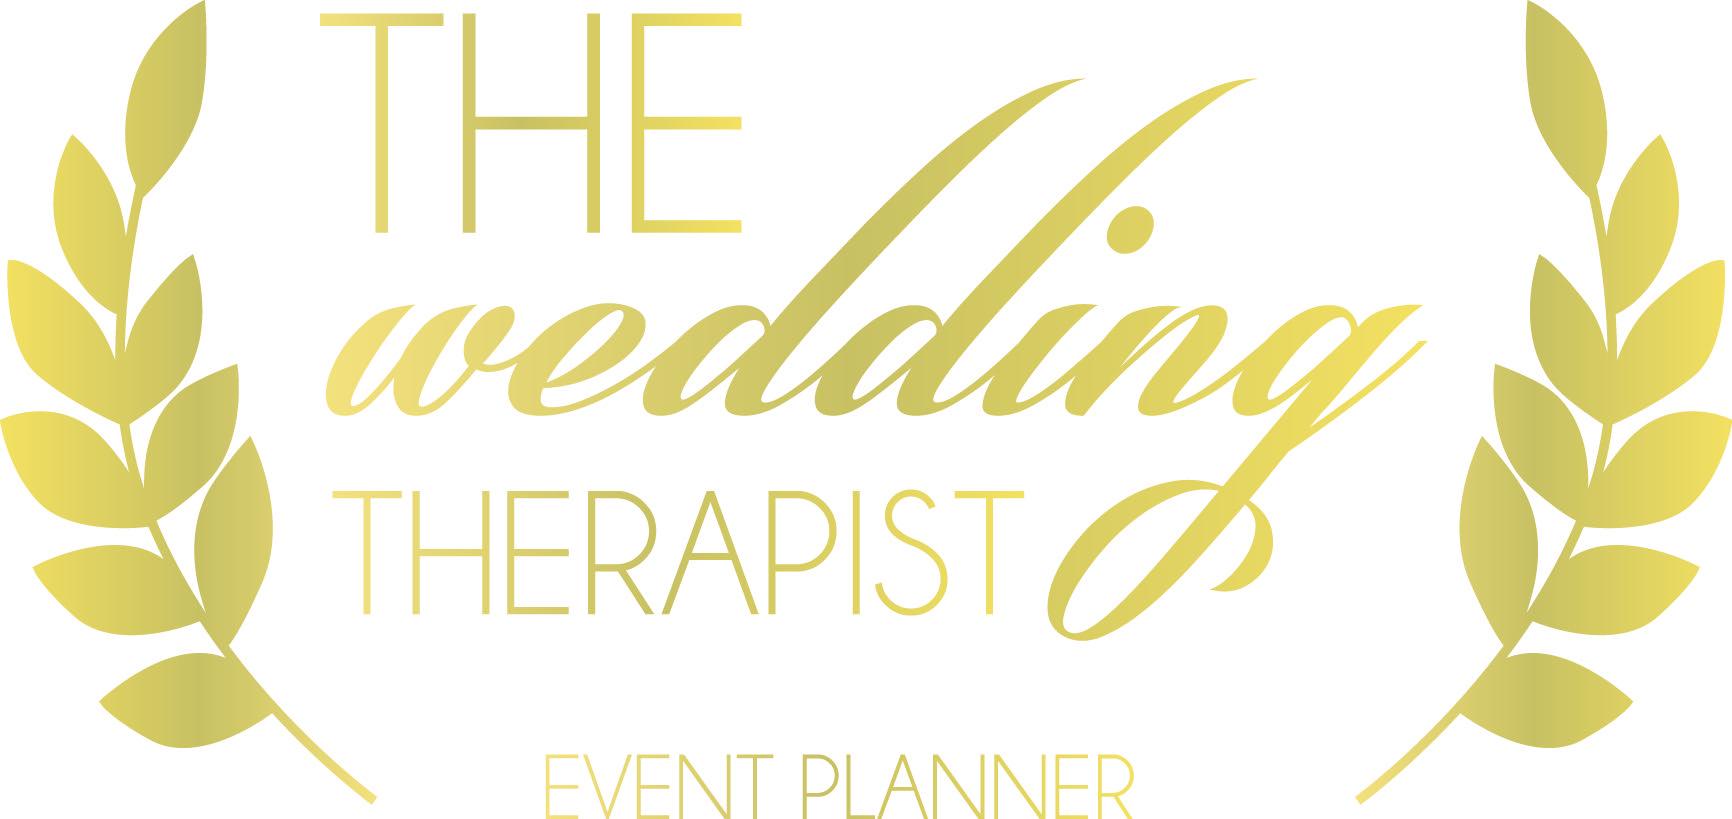 The Wedding Therapist